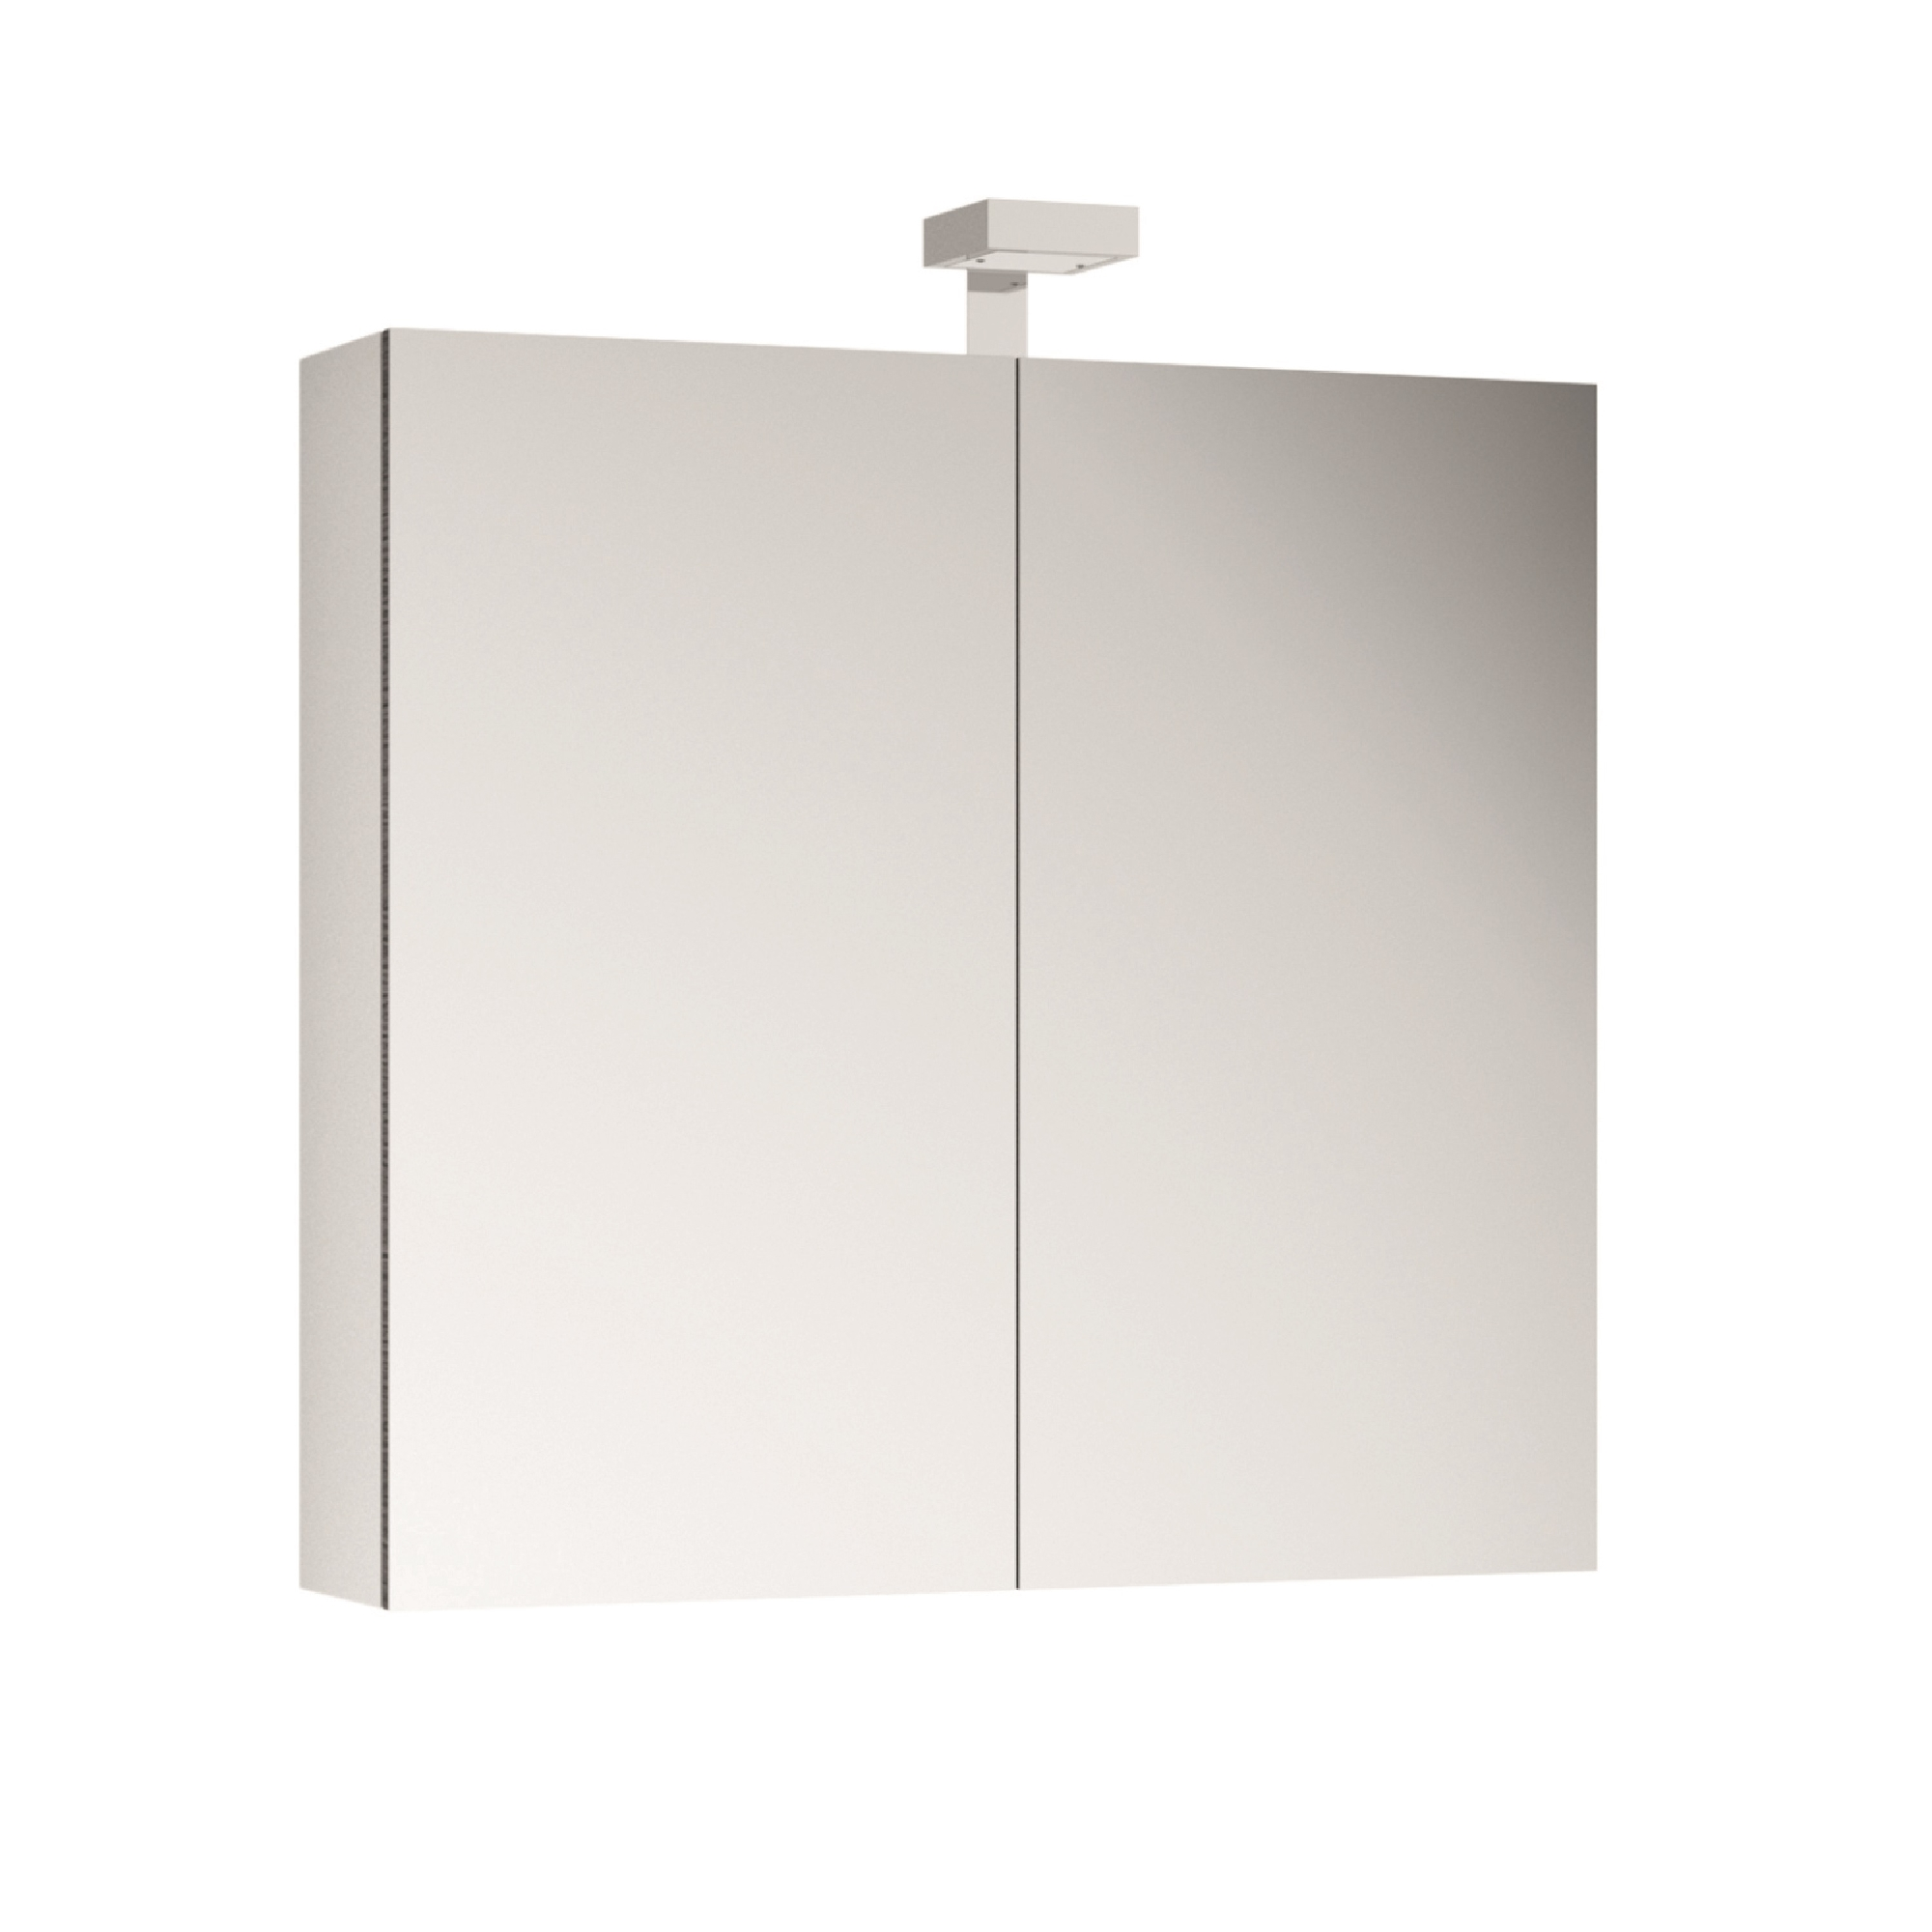 allibert badm bel badm belset vormontiert wei spiegelschrank waschtisch 80 cm ebay. Black Bedroom Furniture Sets. Home Design Ideas